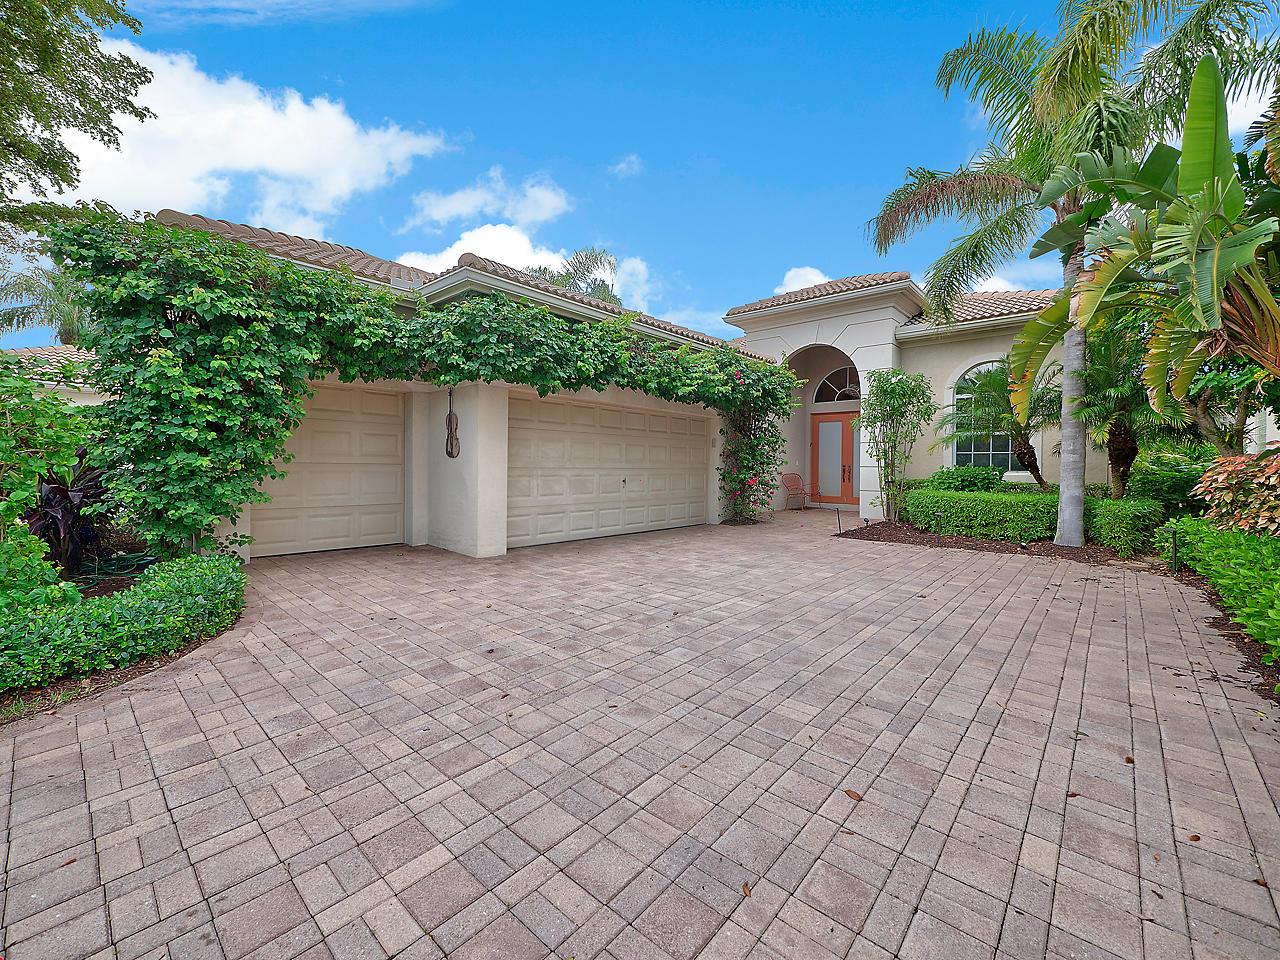 50 Laguna Terrace, Palm Beach Gardens, Florida 33418, 3 Bedrooms Bedrooms, ,3 BathroomsBathrooms,A,Single family,Laguna,RX-10596882